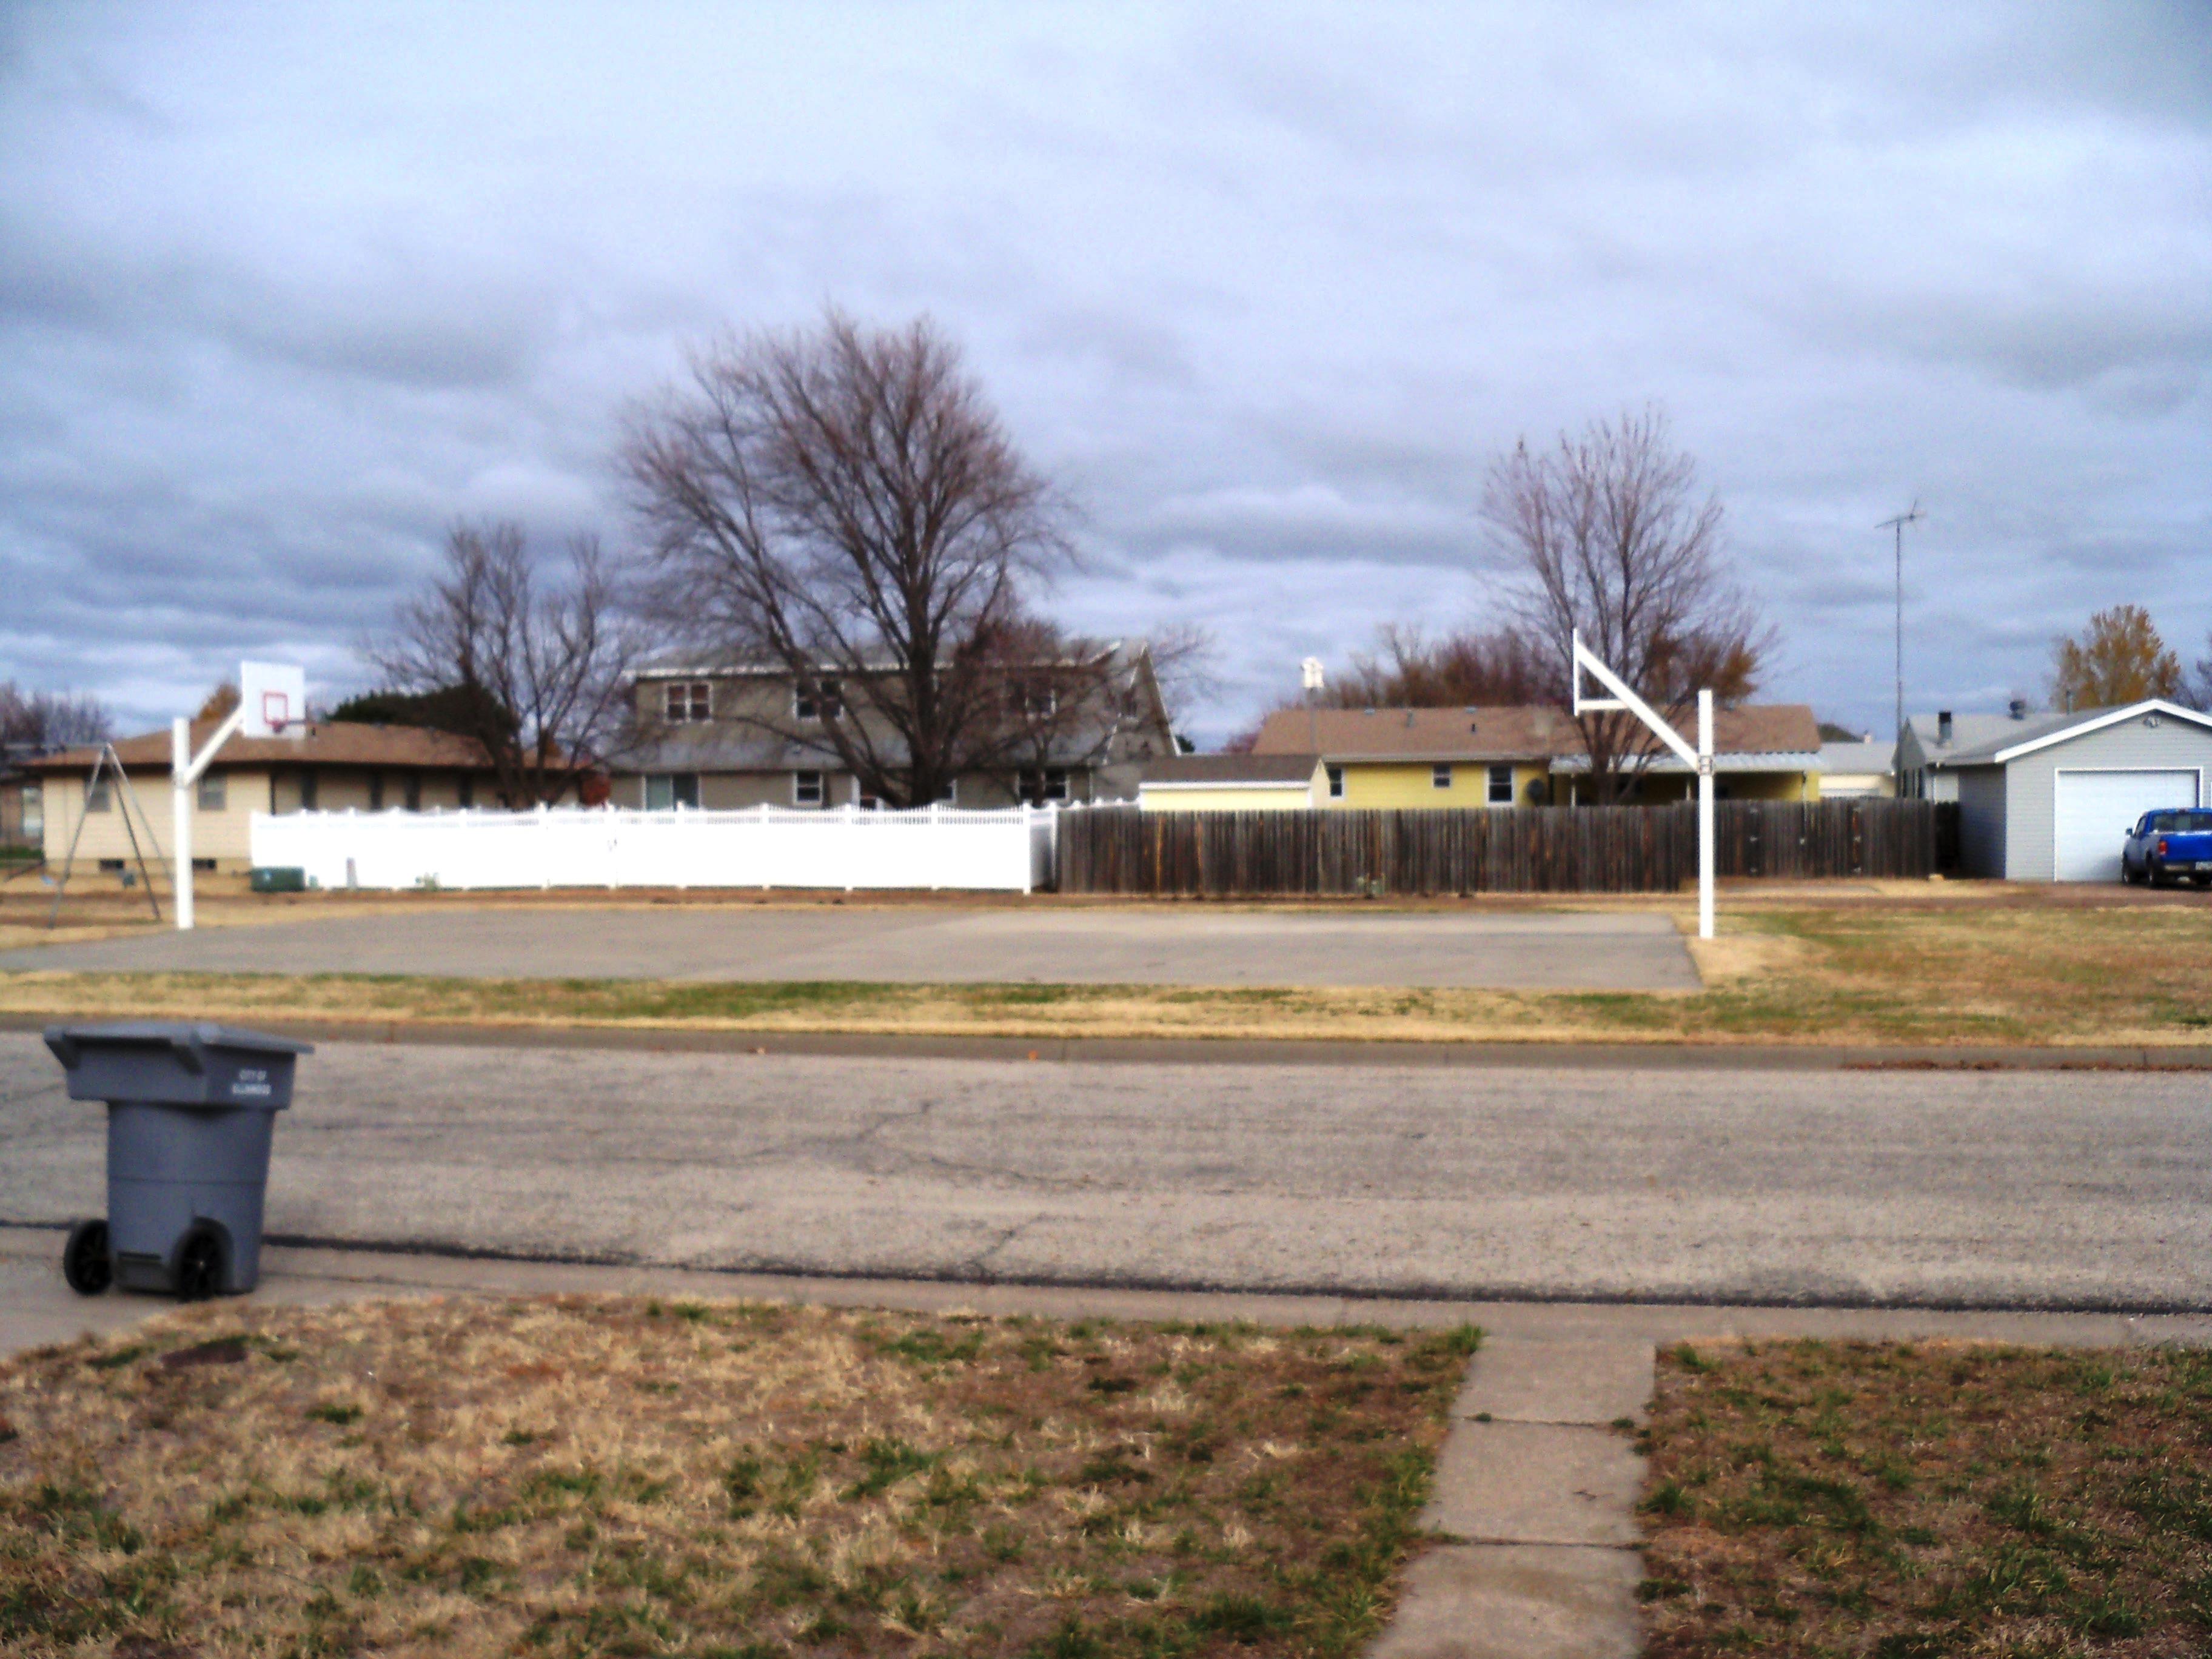 Basketball court across the street